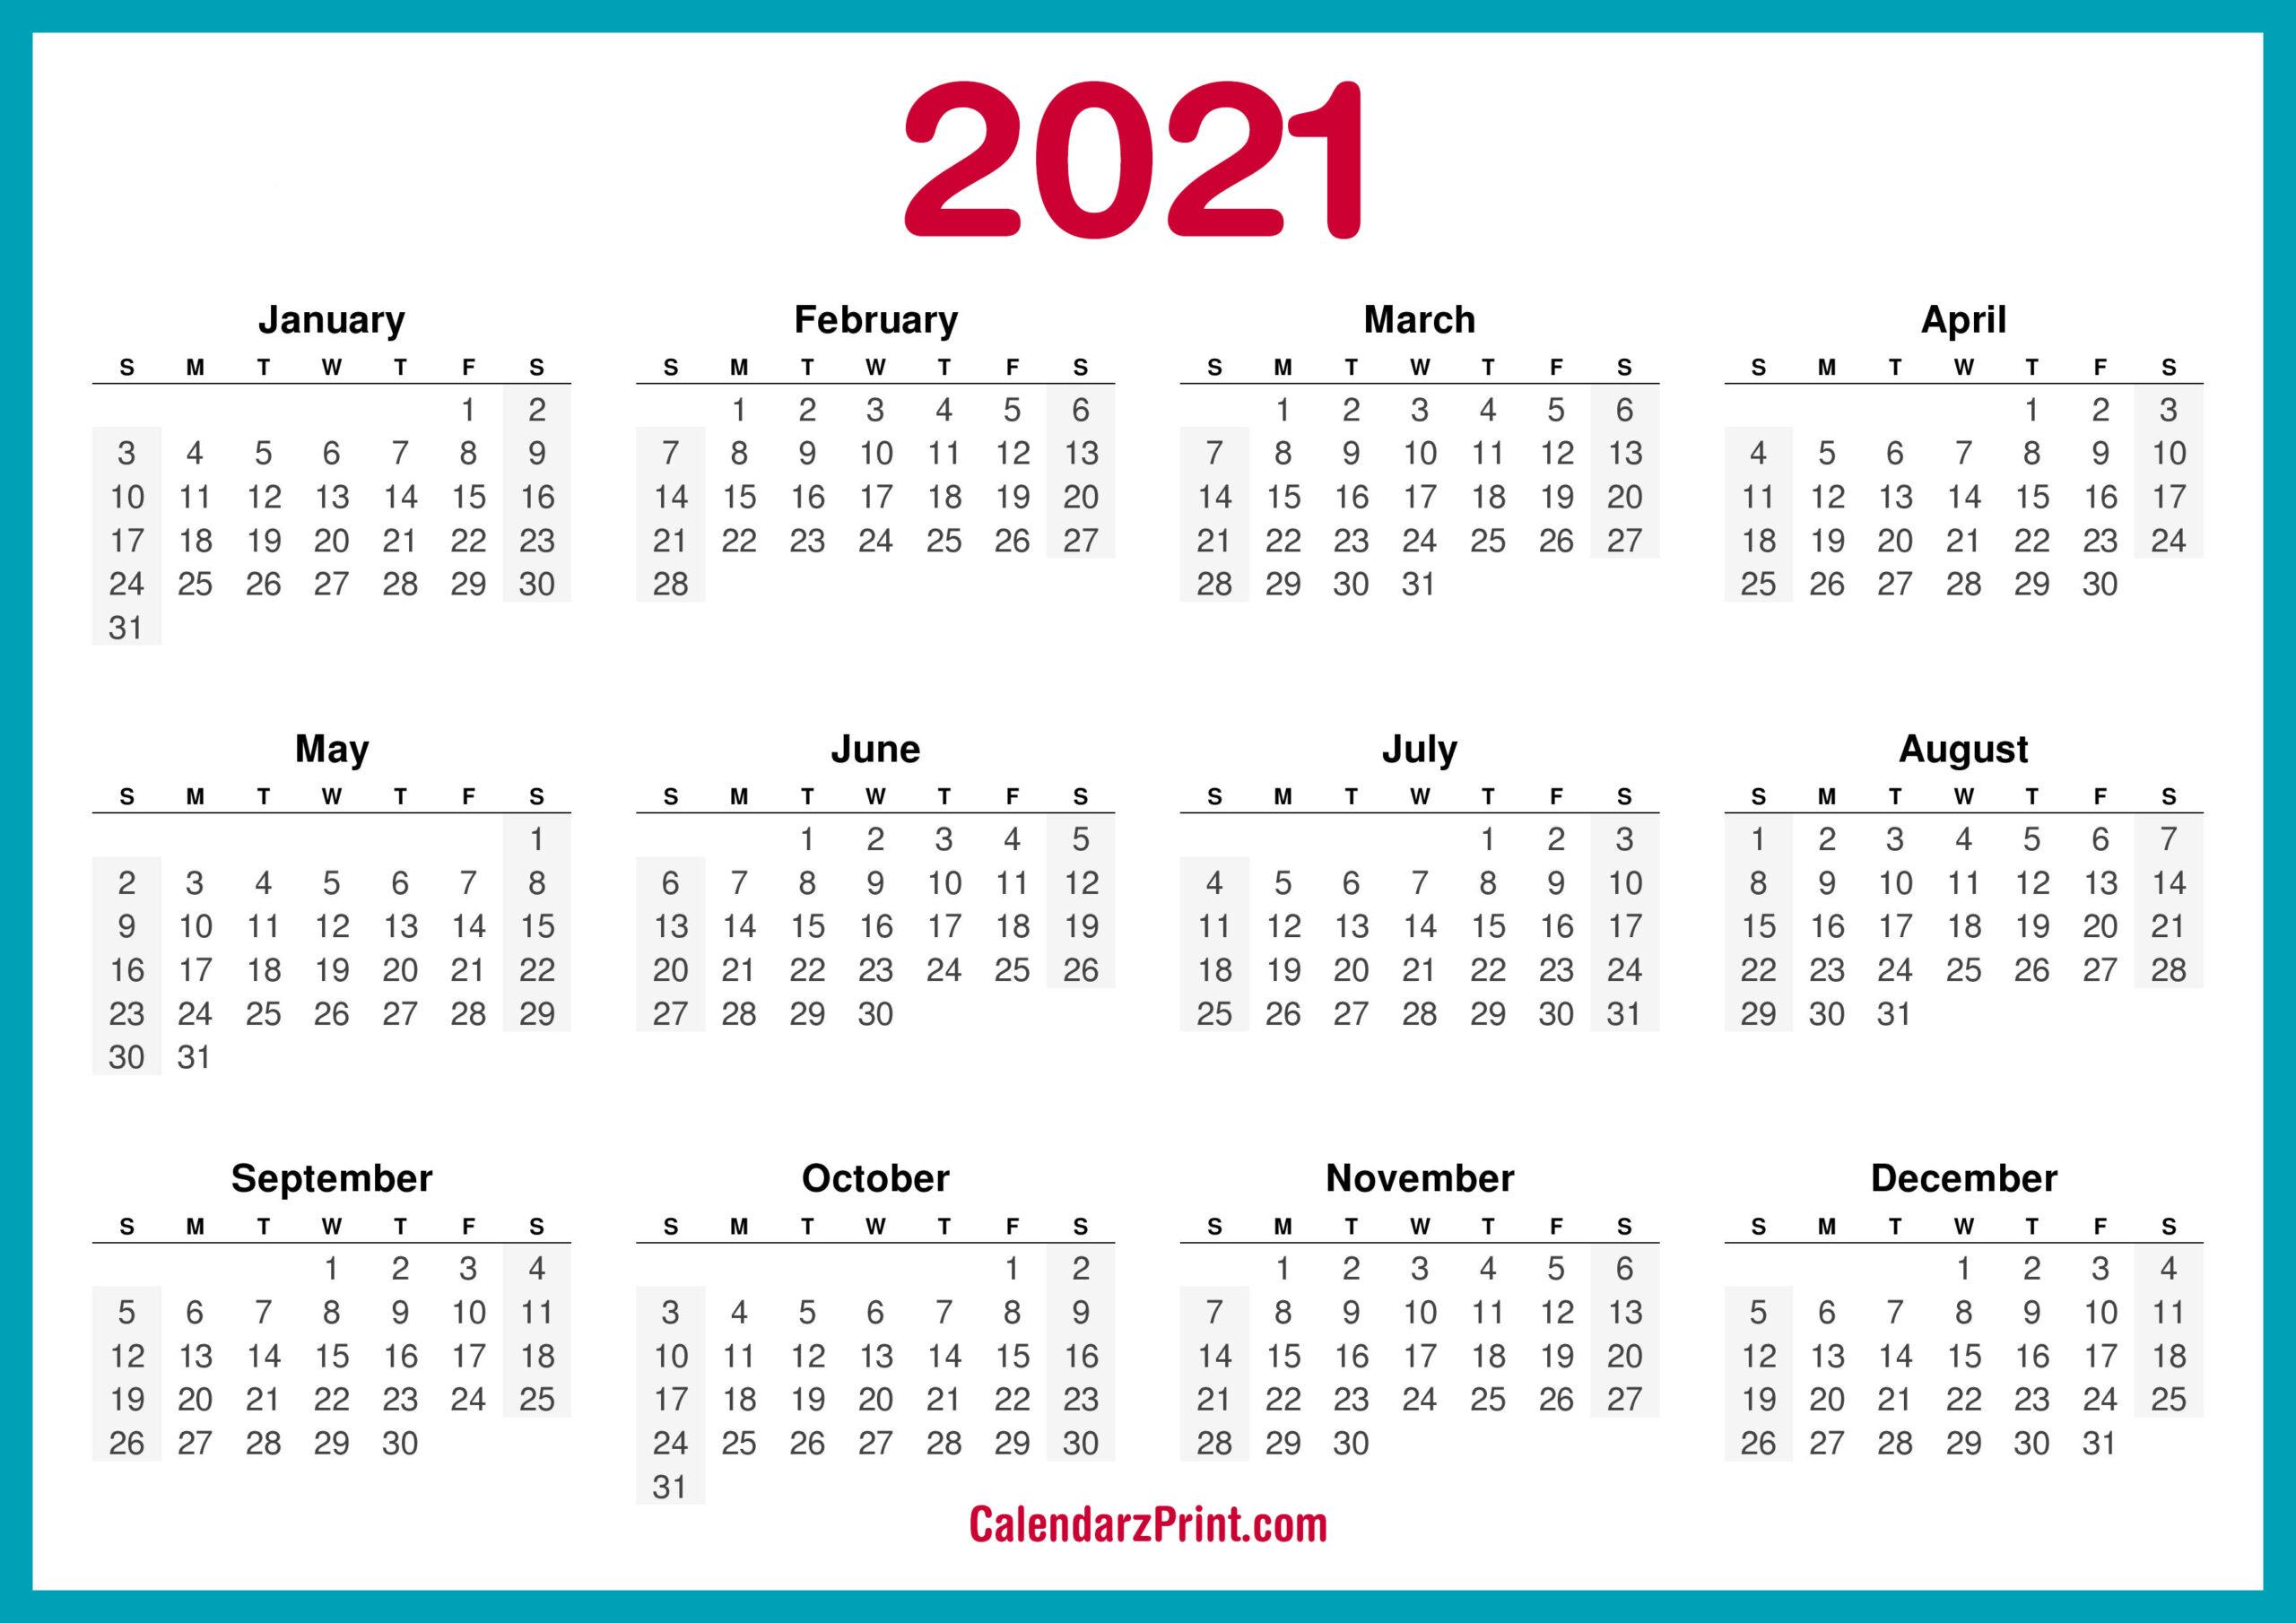 2021 Calendar Printable Free, Horizontal, Hd, Turquoise Blue